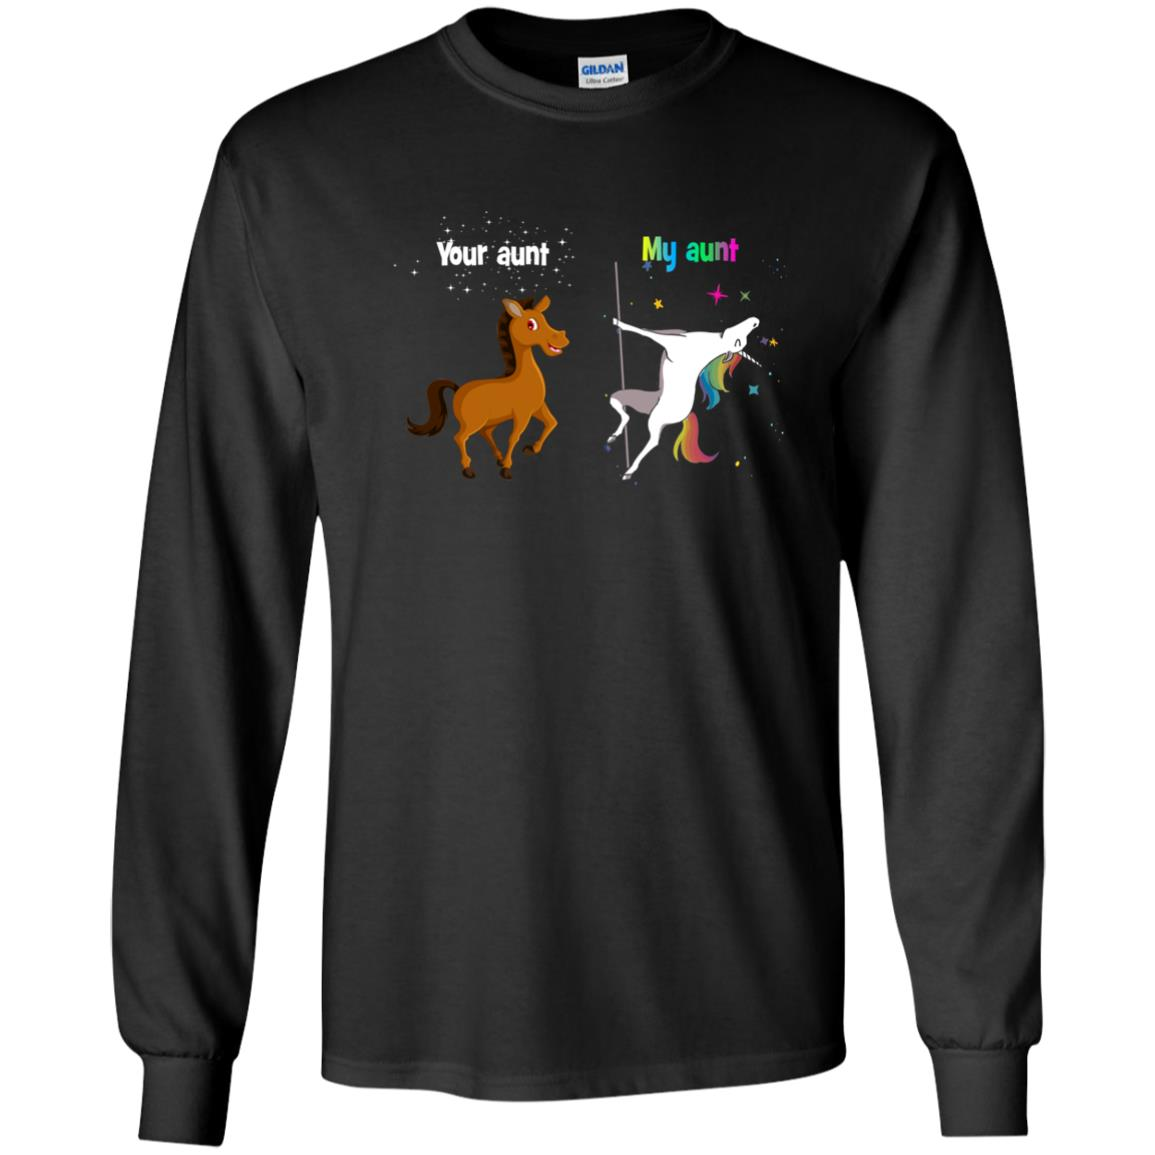 image 965px My aunt unicorn vs your aunt horse youth t shirt